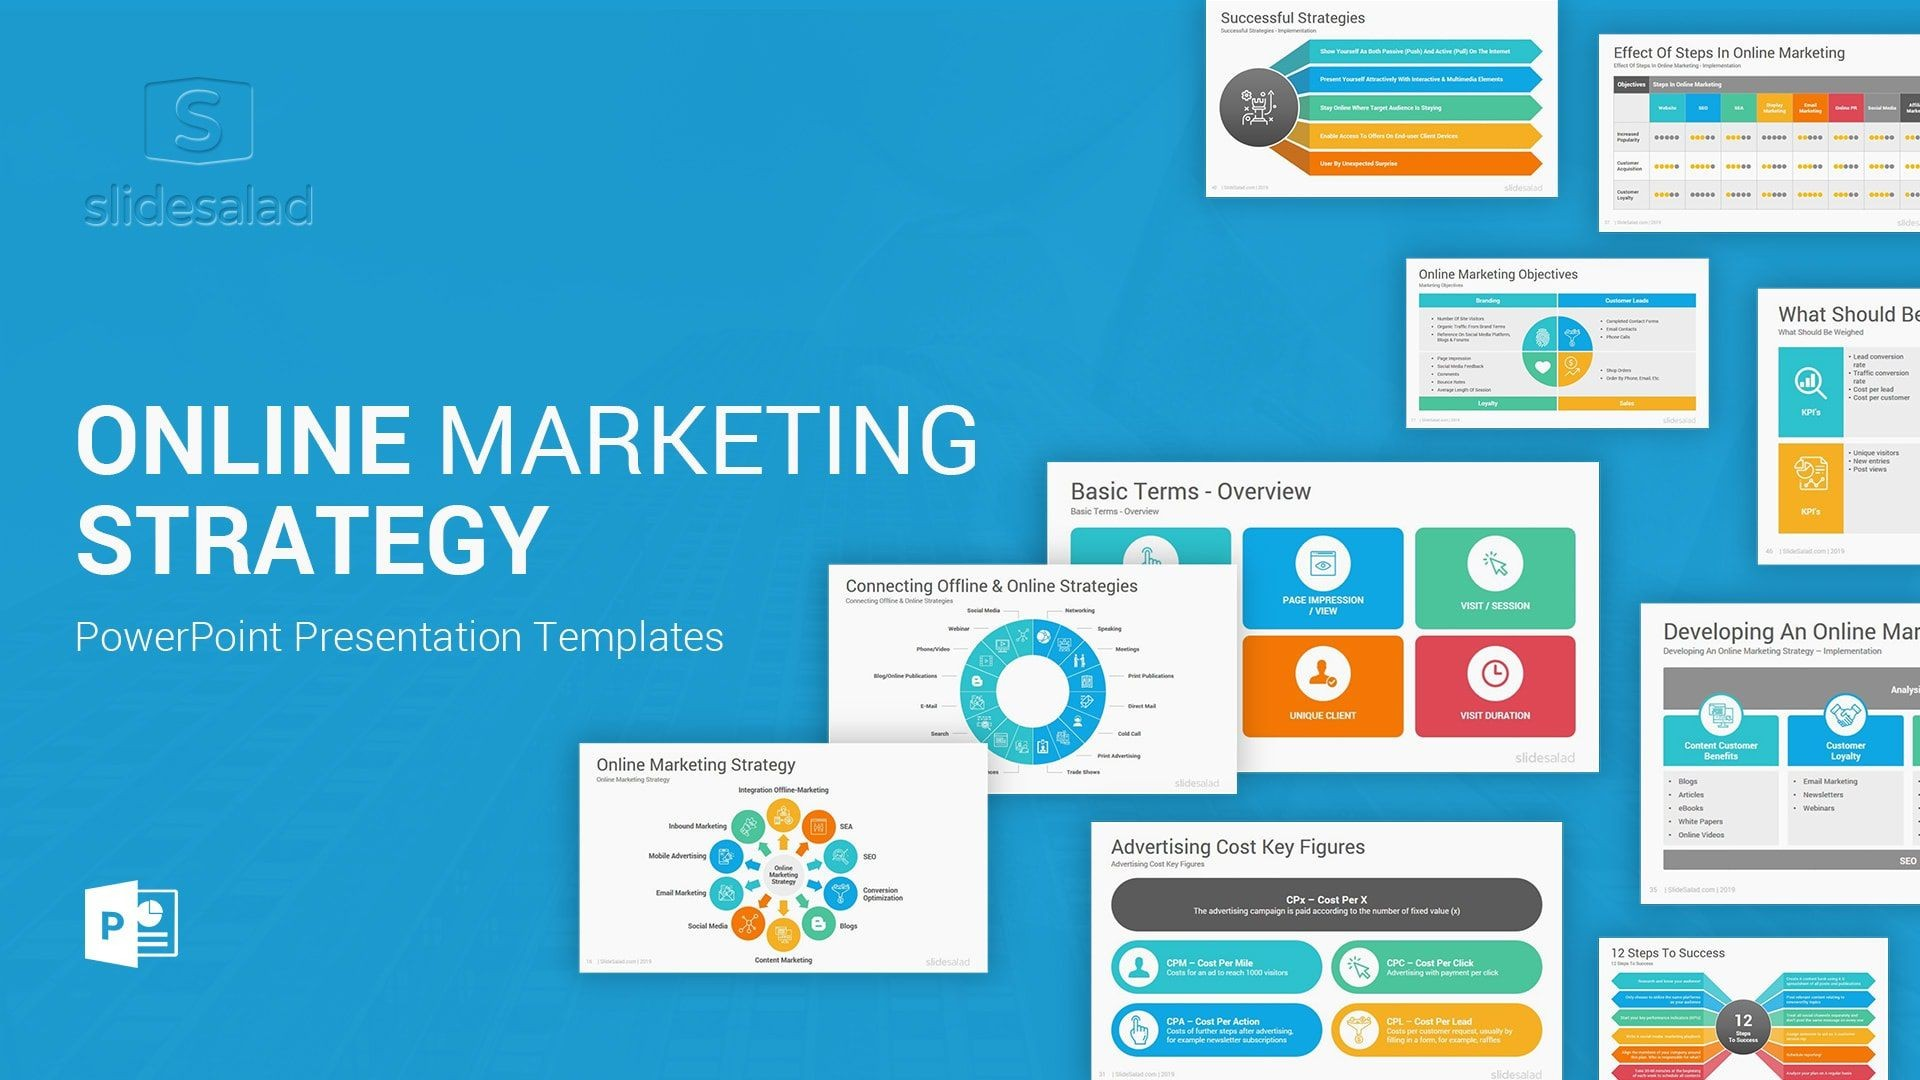 008 Awful Digital Marketing Plan Template Ppt High Def  Presentation Free Slideshare1920